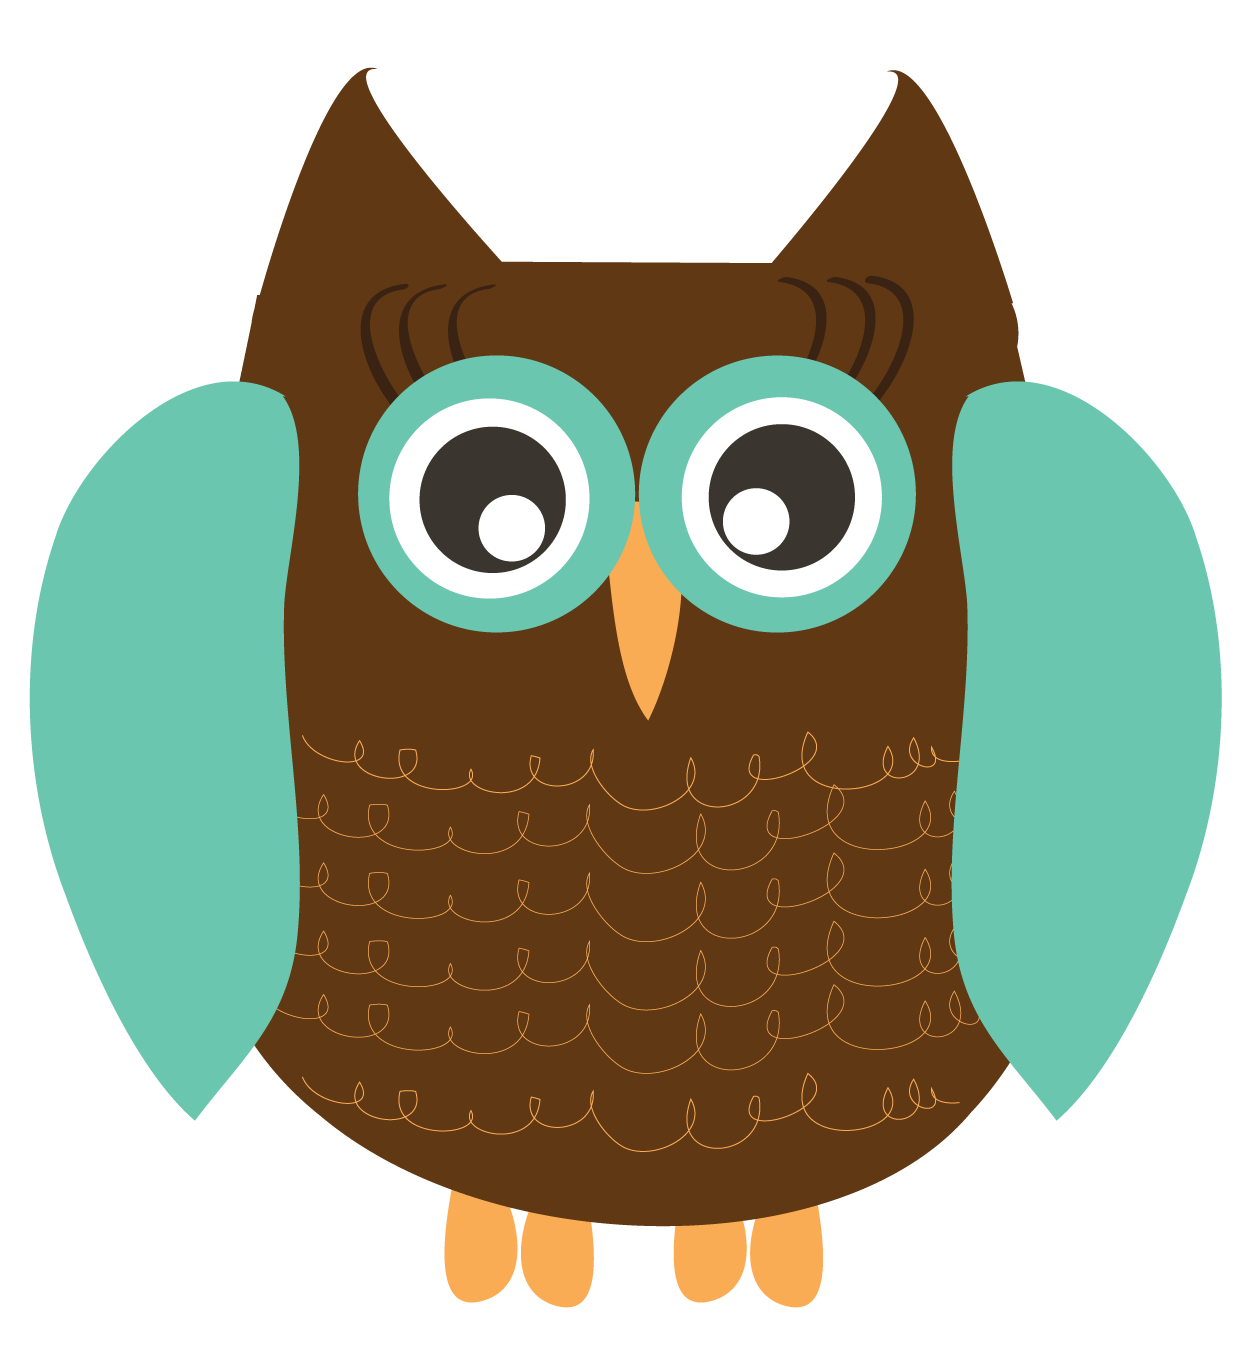 Star owl clipart vector stock For - Love Owls Clipart | Owl love u always | Pinterest | Owl, Owl ... vector stock